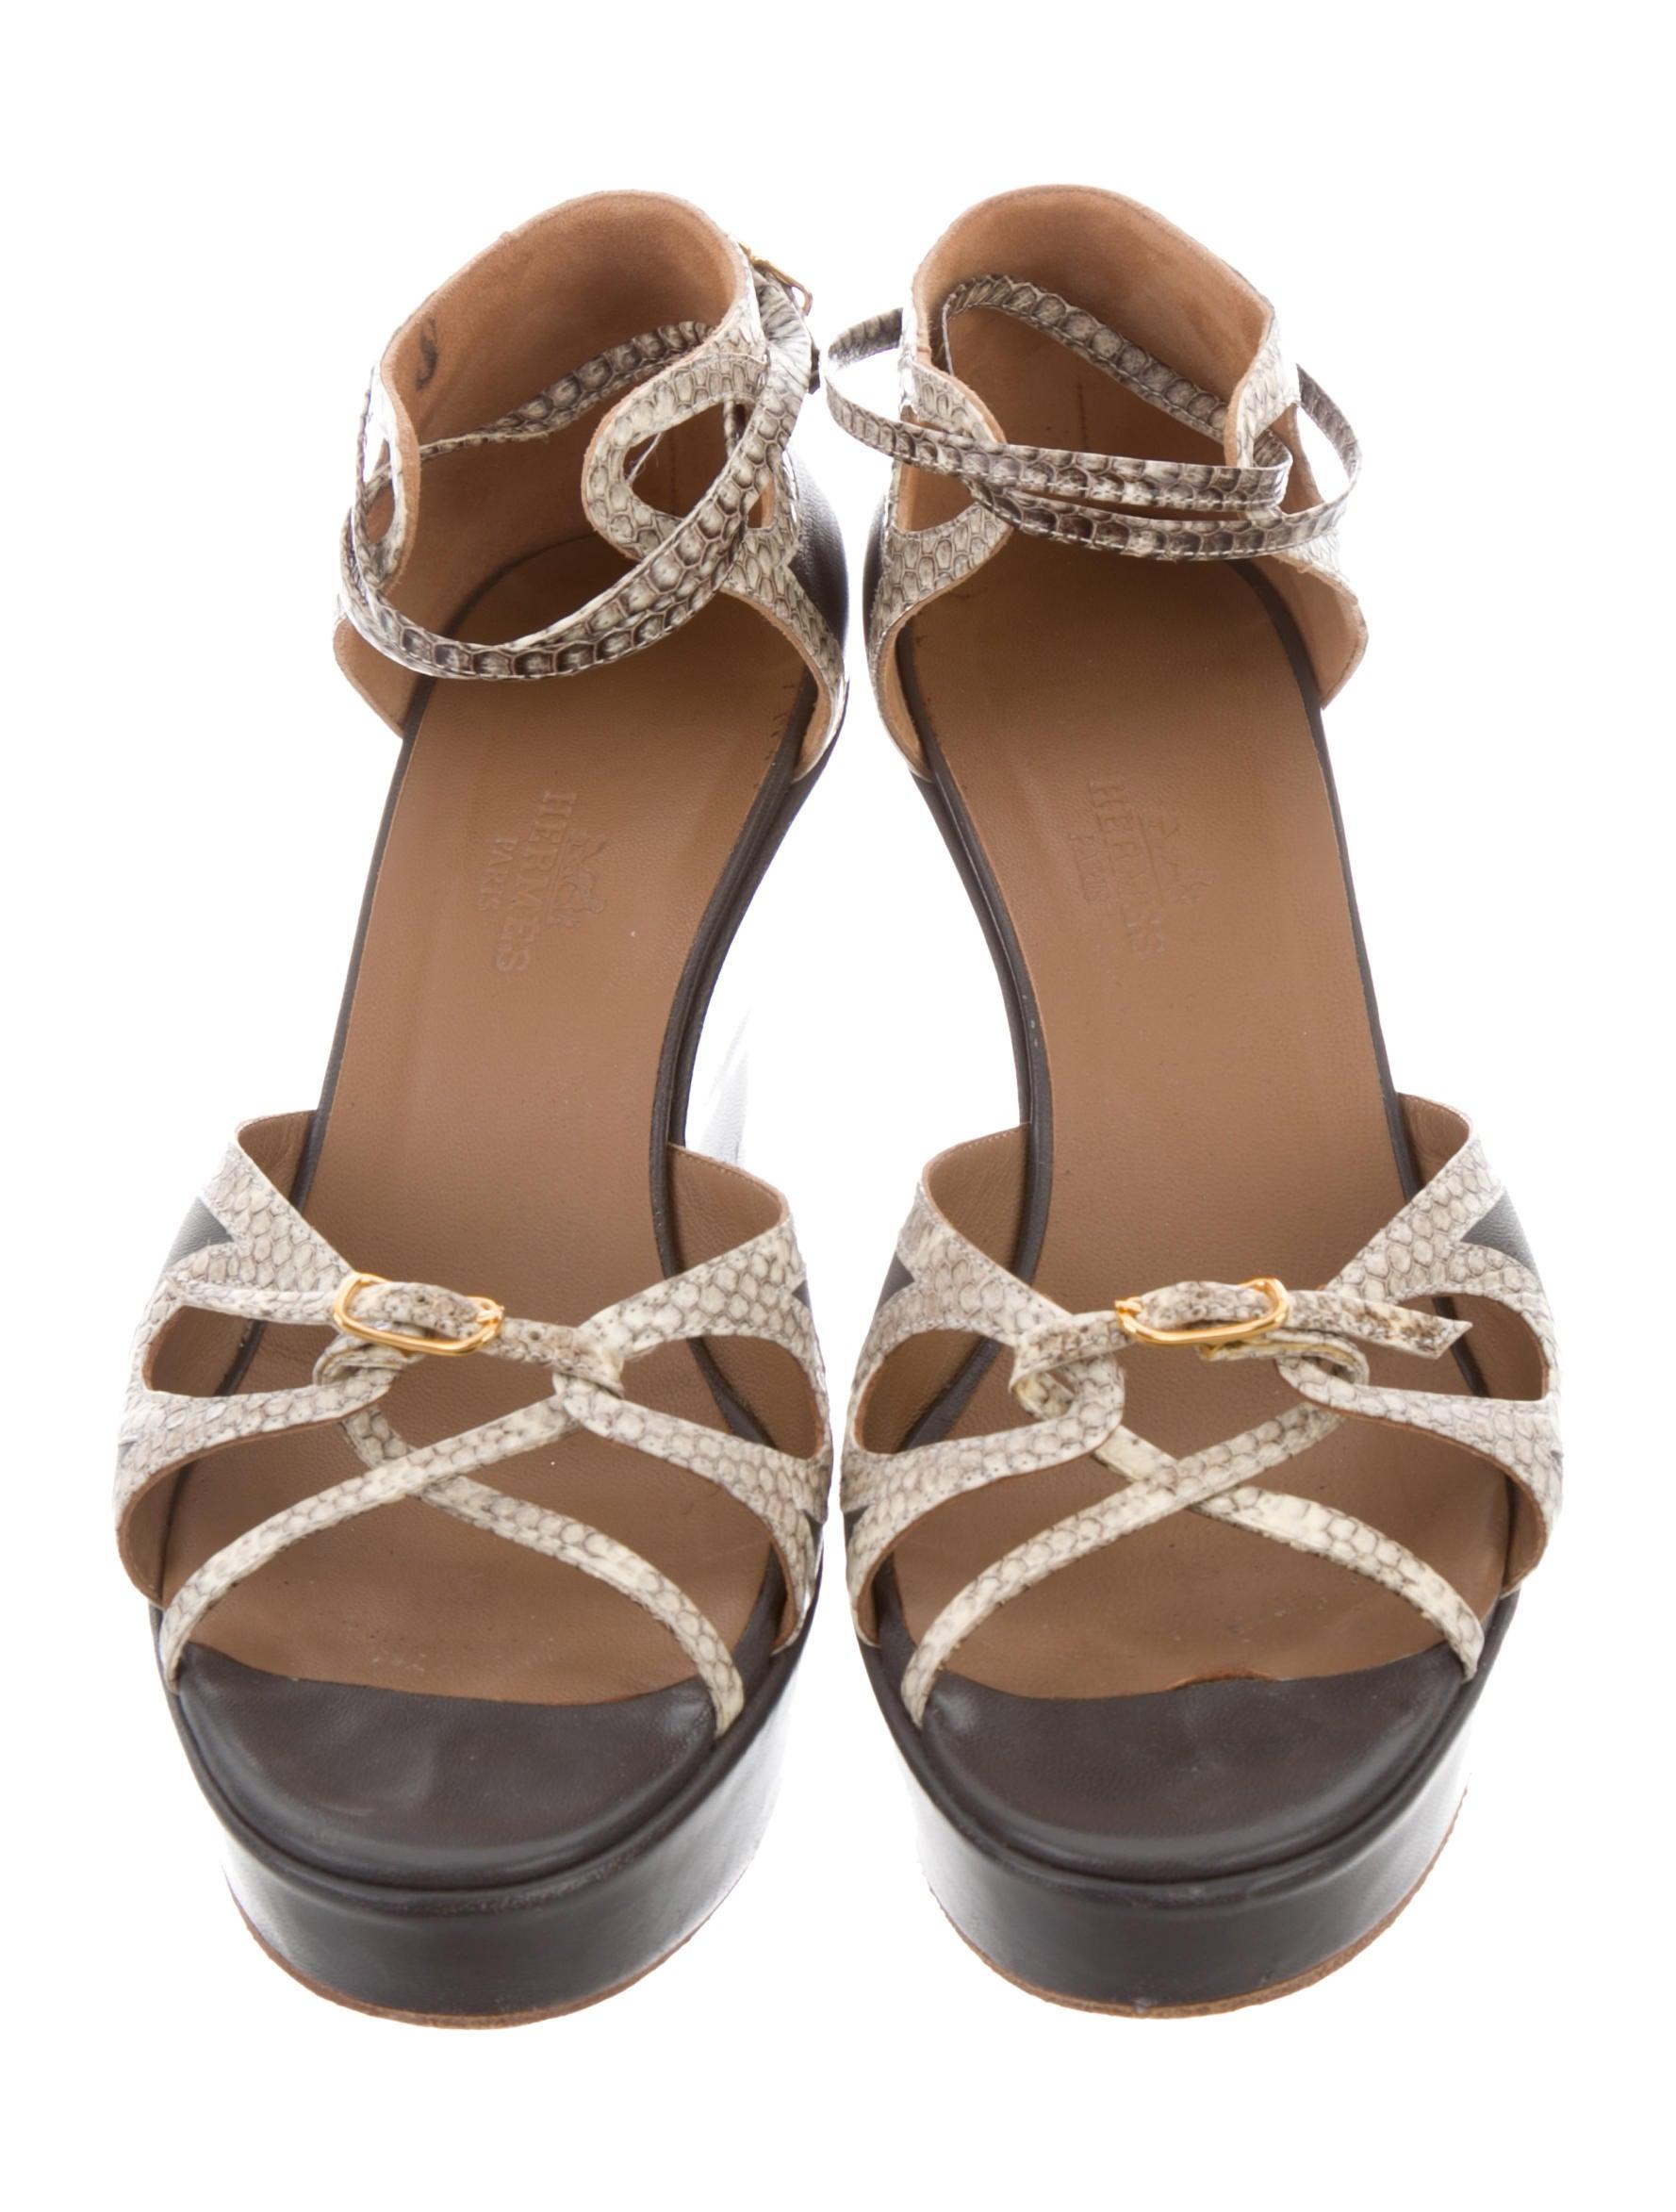 sale release dates Hermès Snakeskin-Trimmed Wedge Sandals lowest price cheap price JUWol39NPf